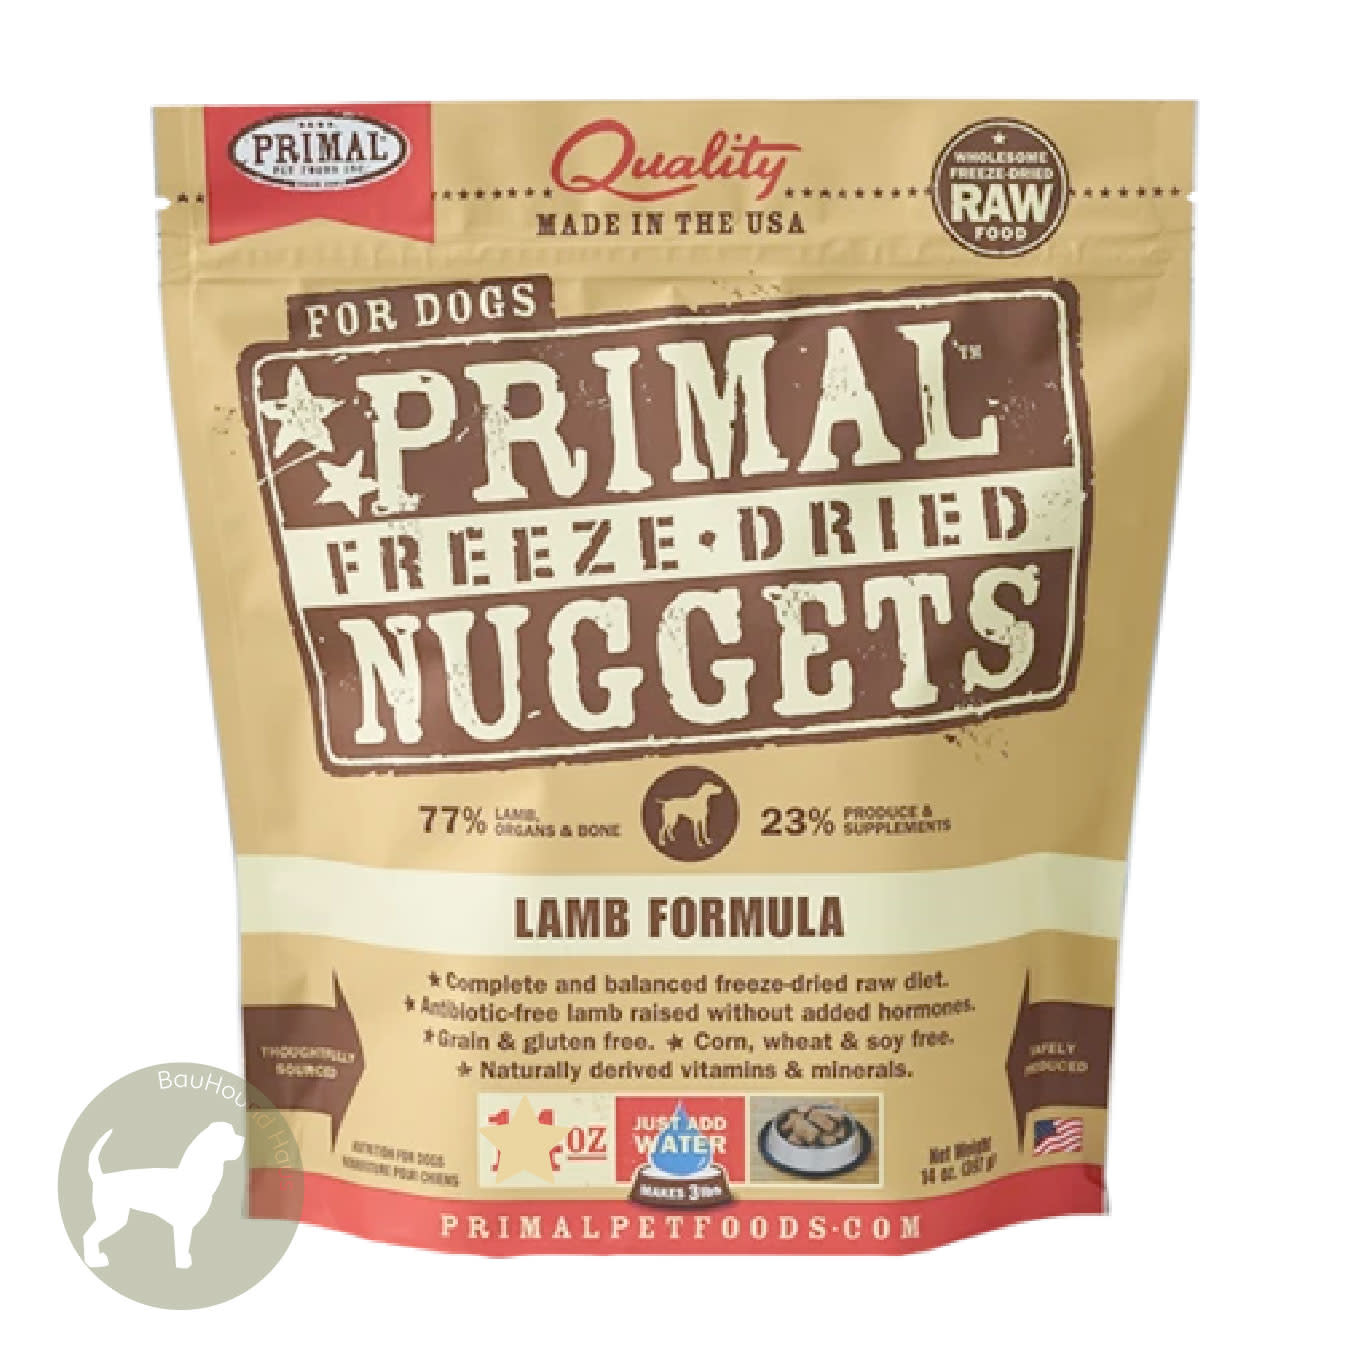 Primal Pet Foods Primal Pet Foods Freeze Dried Formula Lamb, 14oz